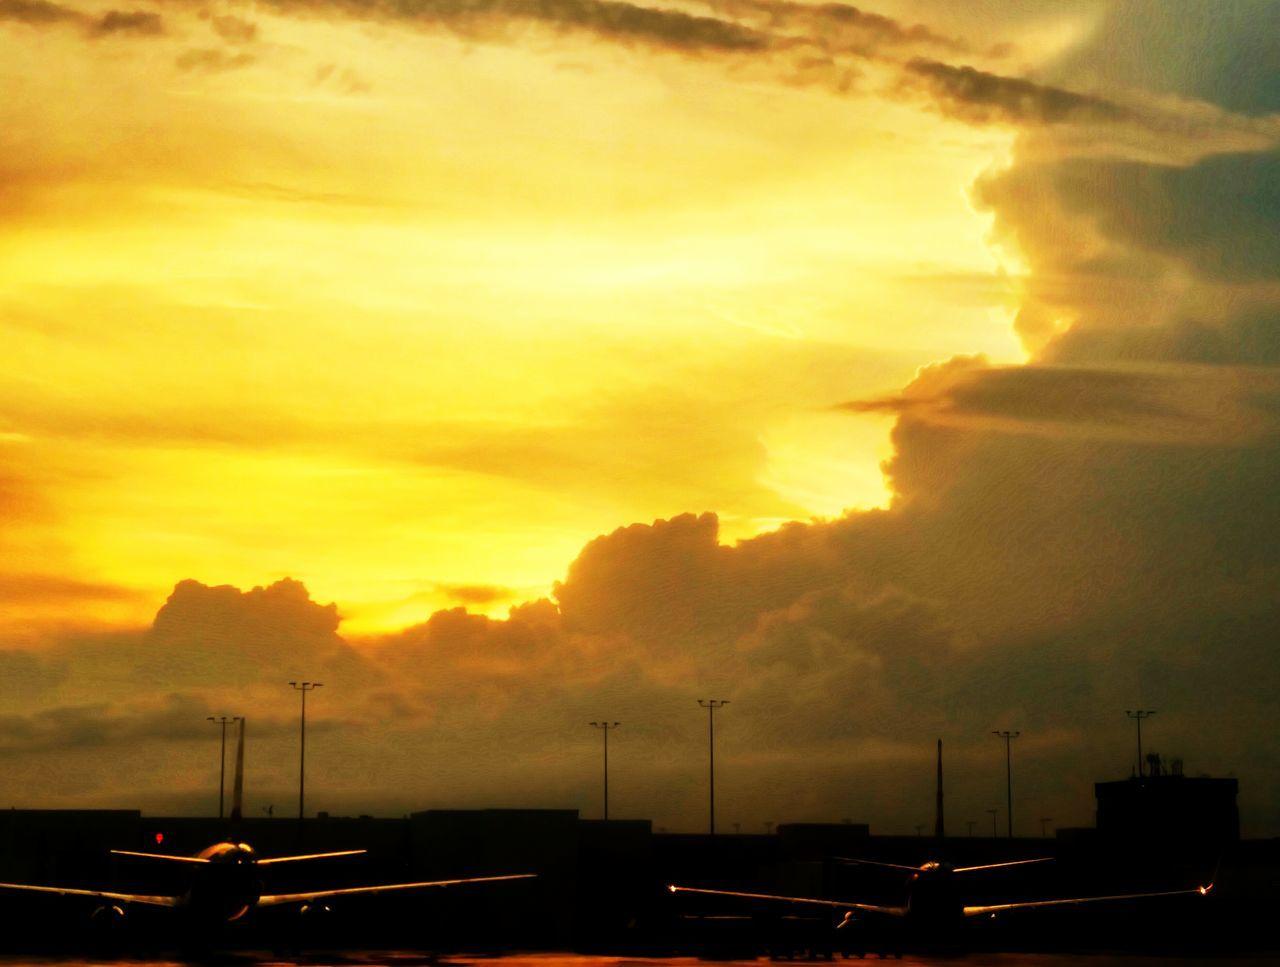 43 Golden Moments Sunset Transportation Clouds Planes